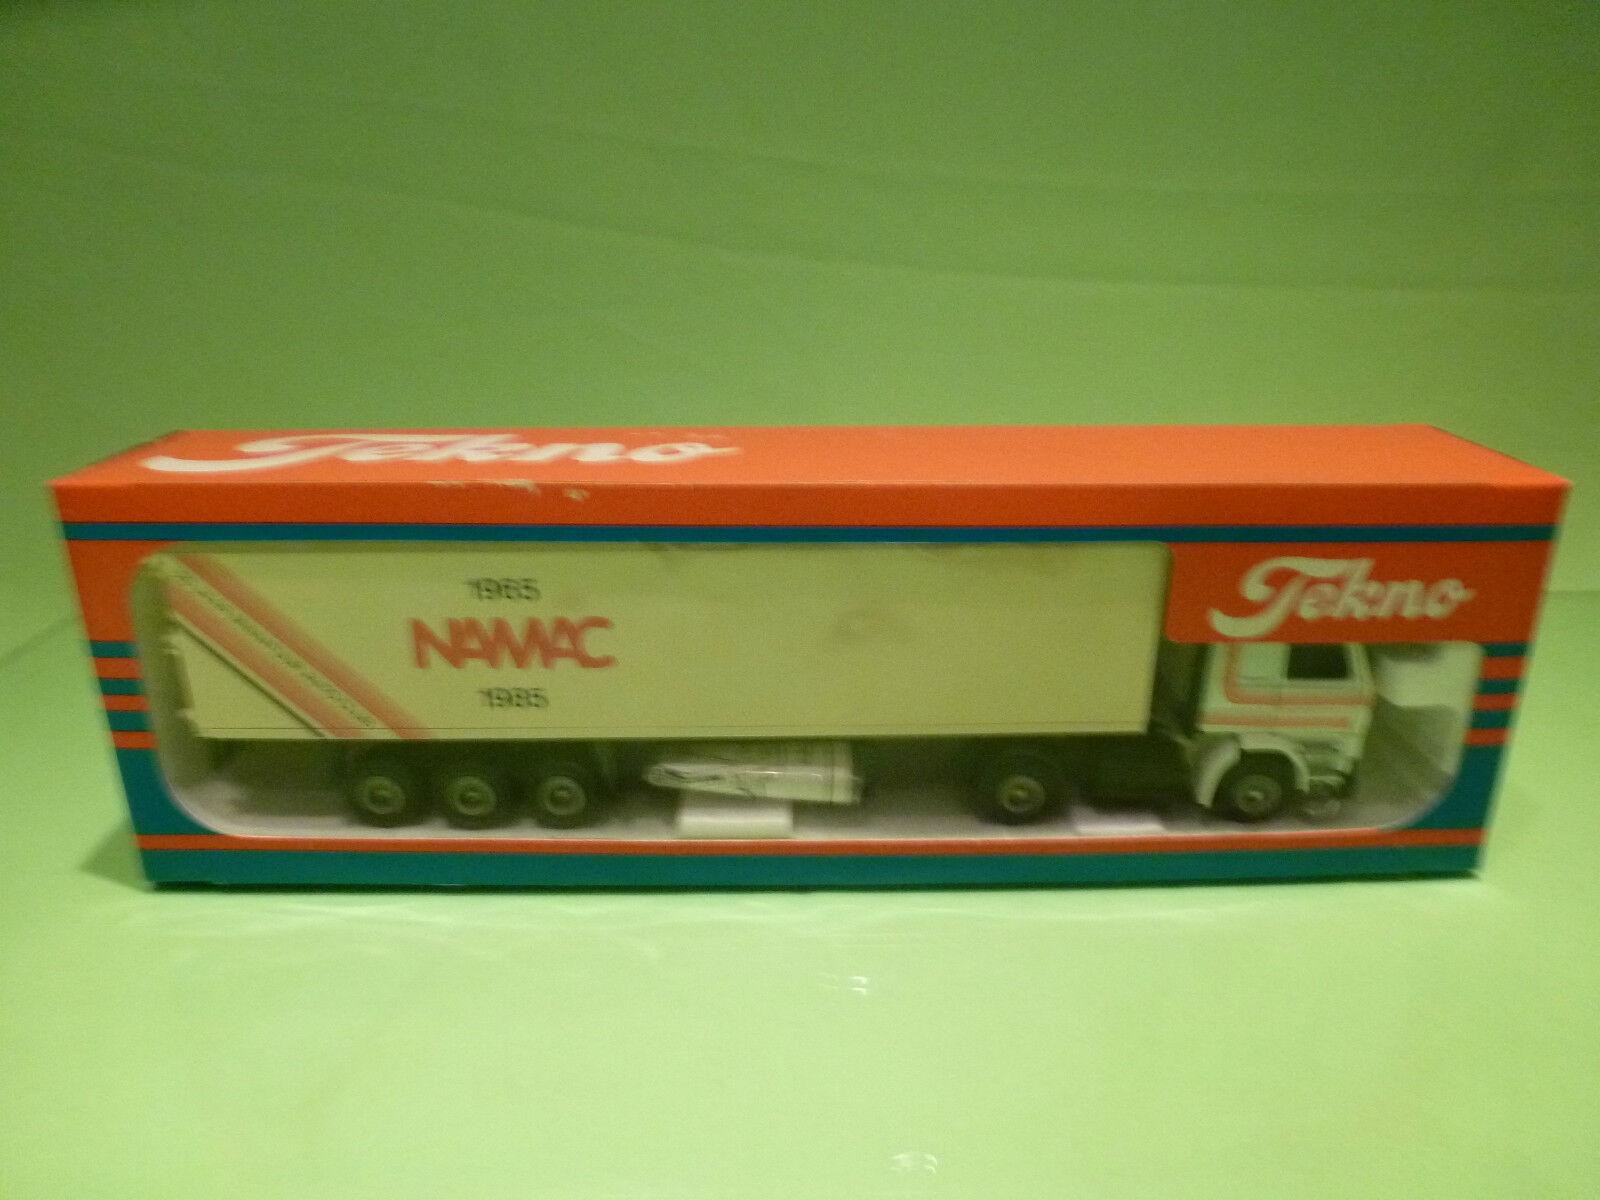 TEKNO DENMARK SCANIA 142H - NAMAC 1965 1985 - RARE SELTEN - GOOD COND. IN BOX